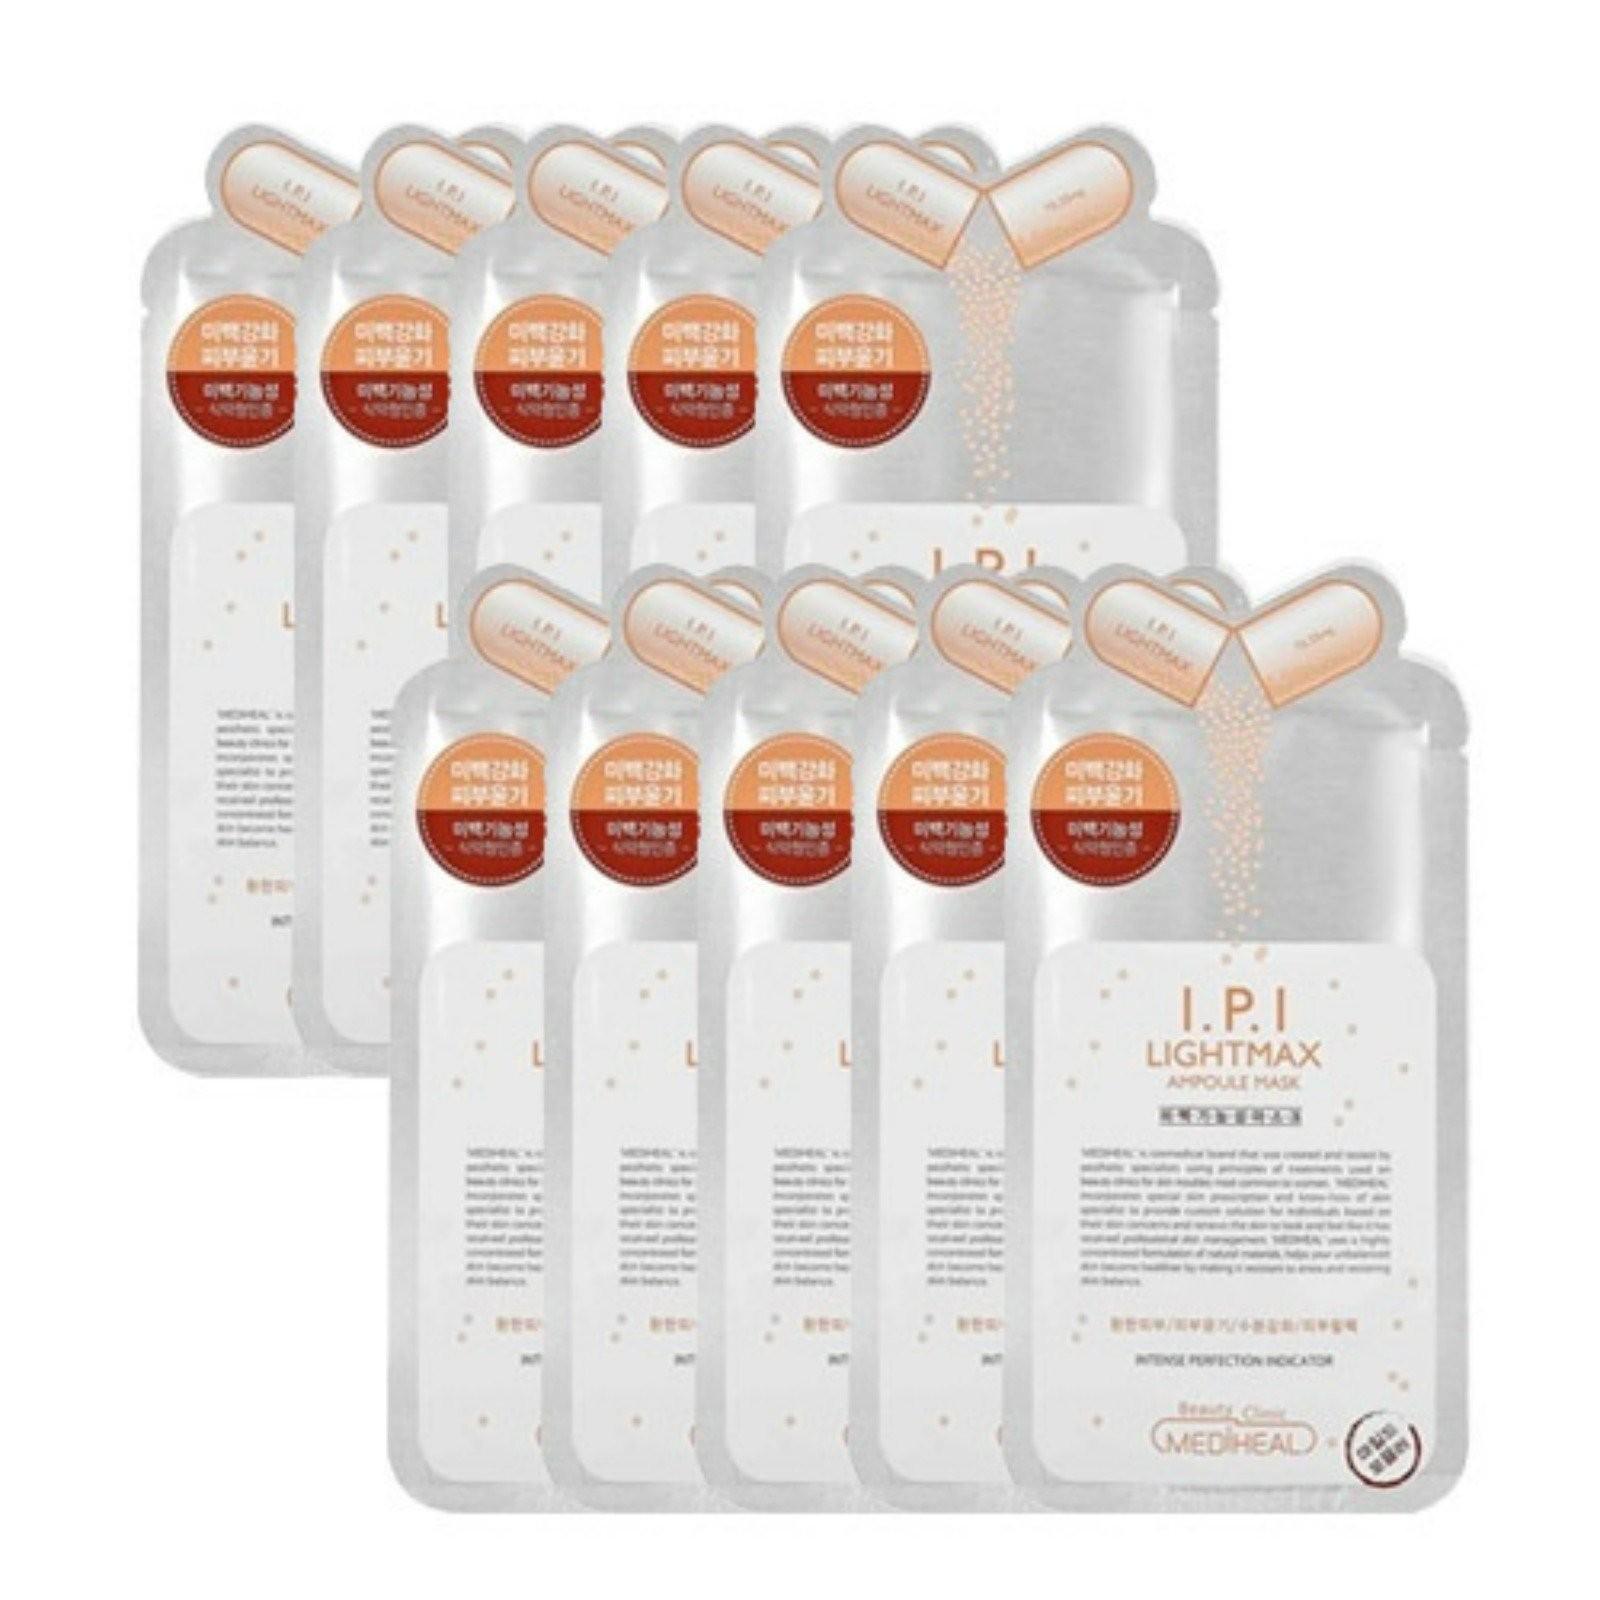 Mediheal - IPI Lightmax Ampoule Mask EX Pack